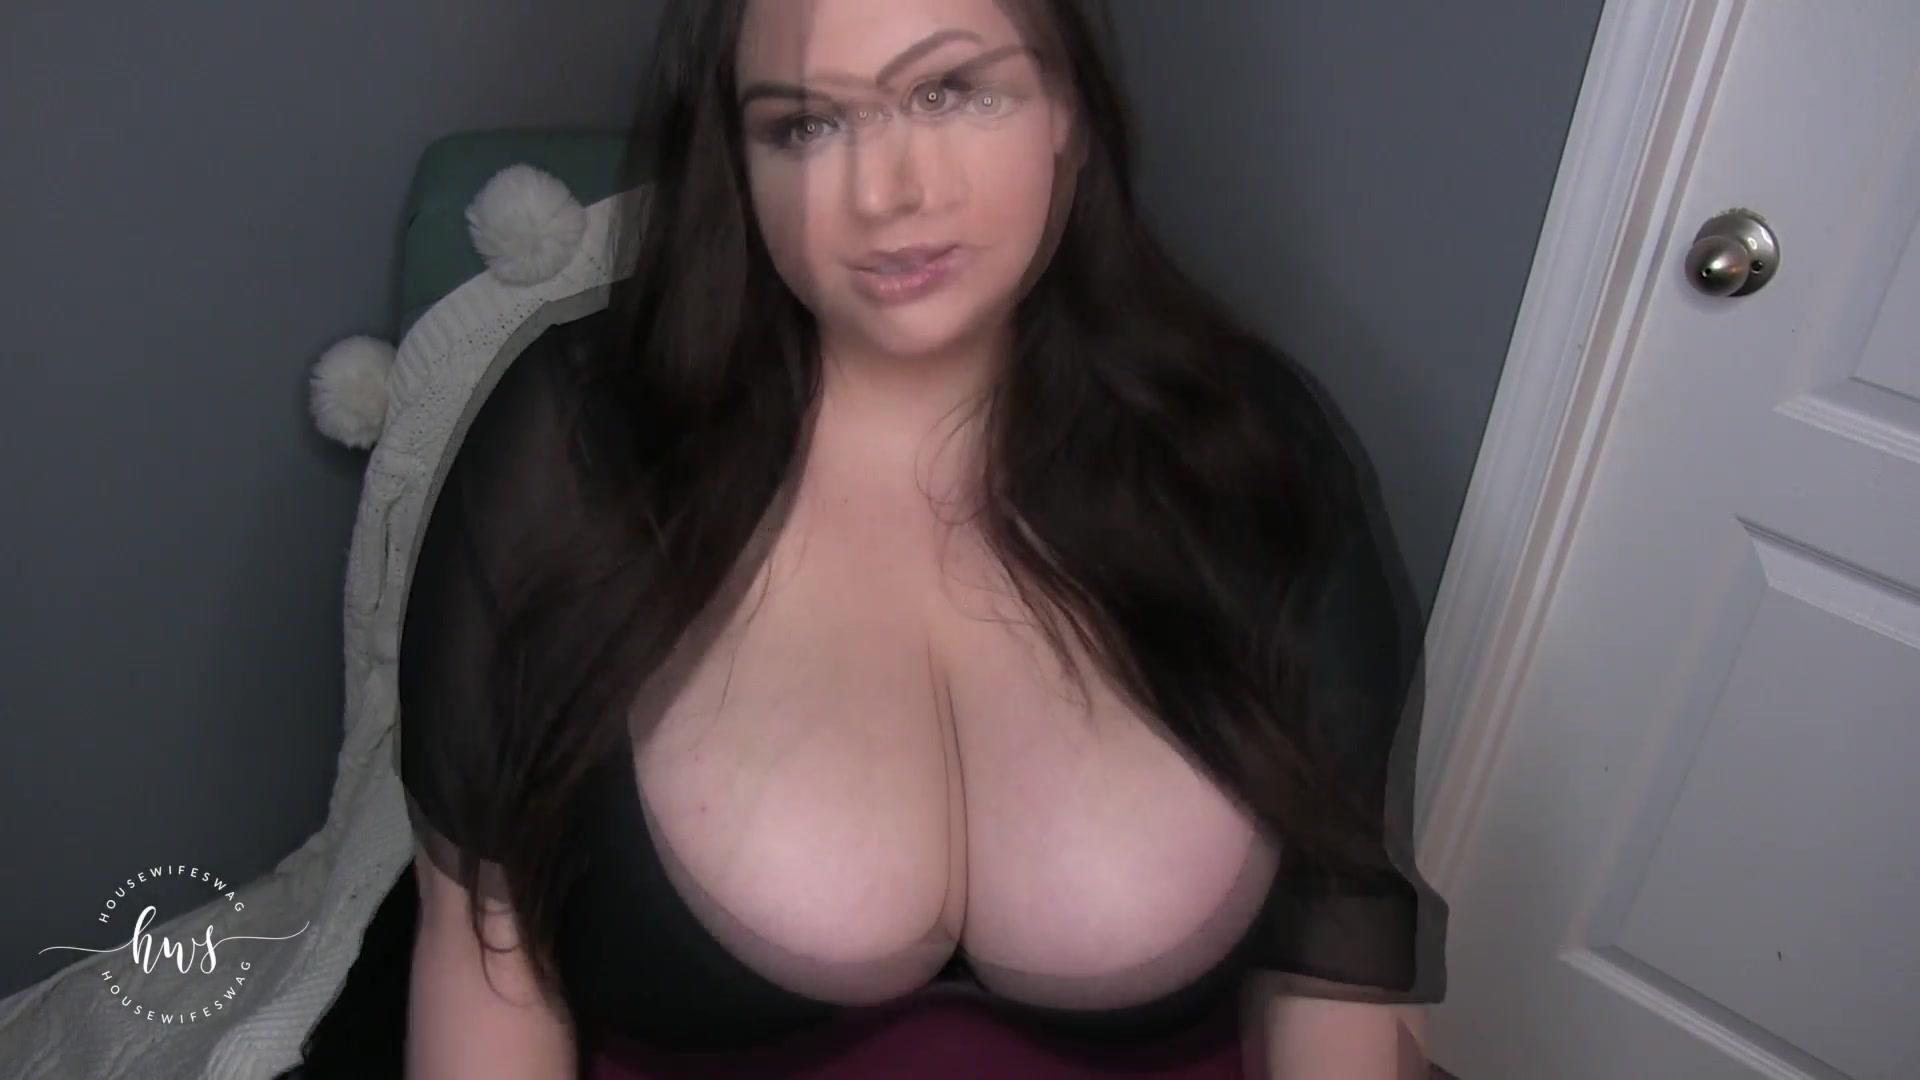 housewifeswag – girlfriend joi - camvideos.tv